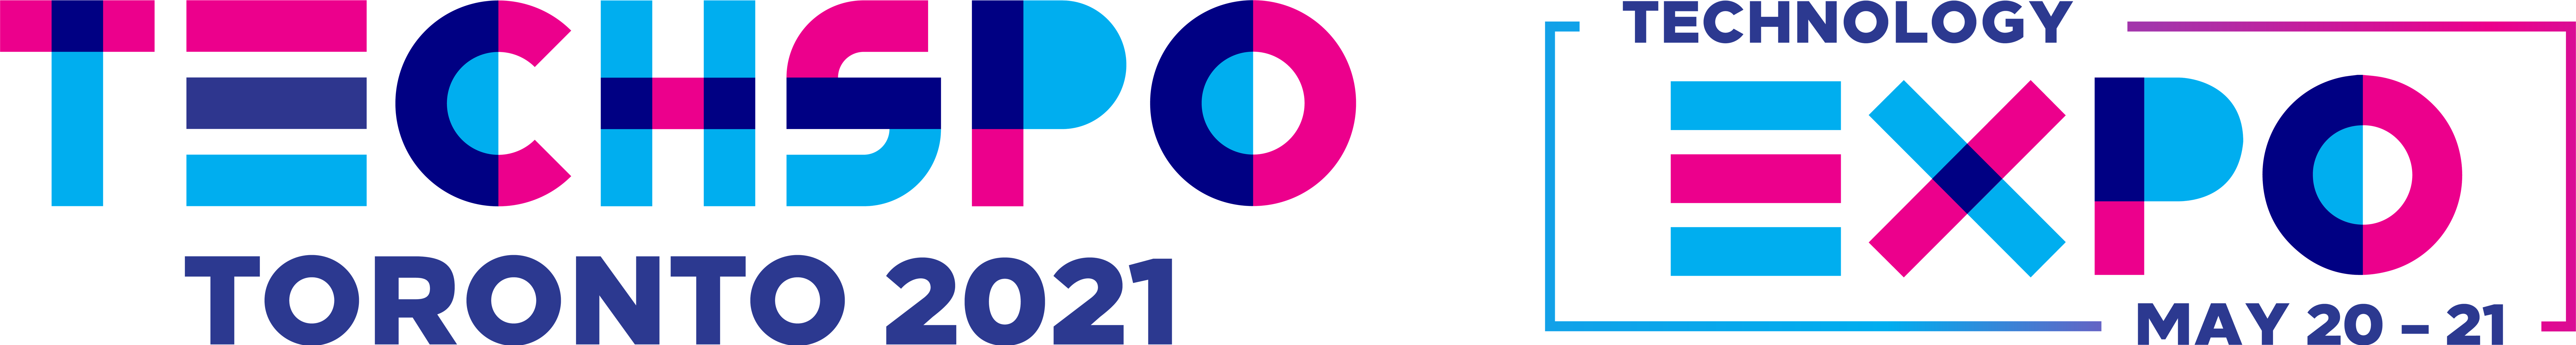 TECHSPO Toronto 2021